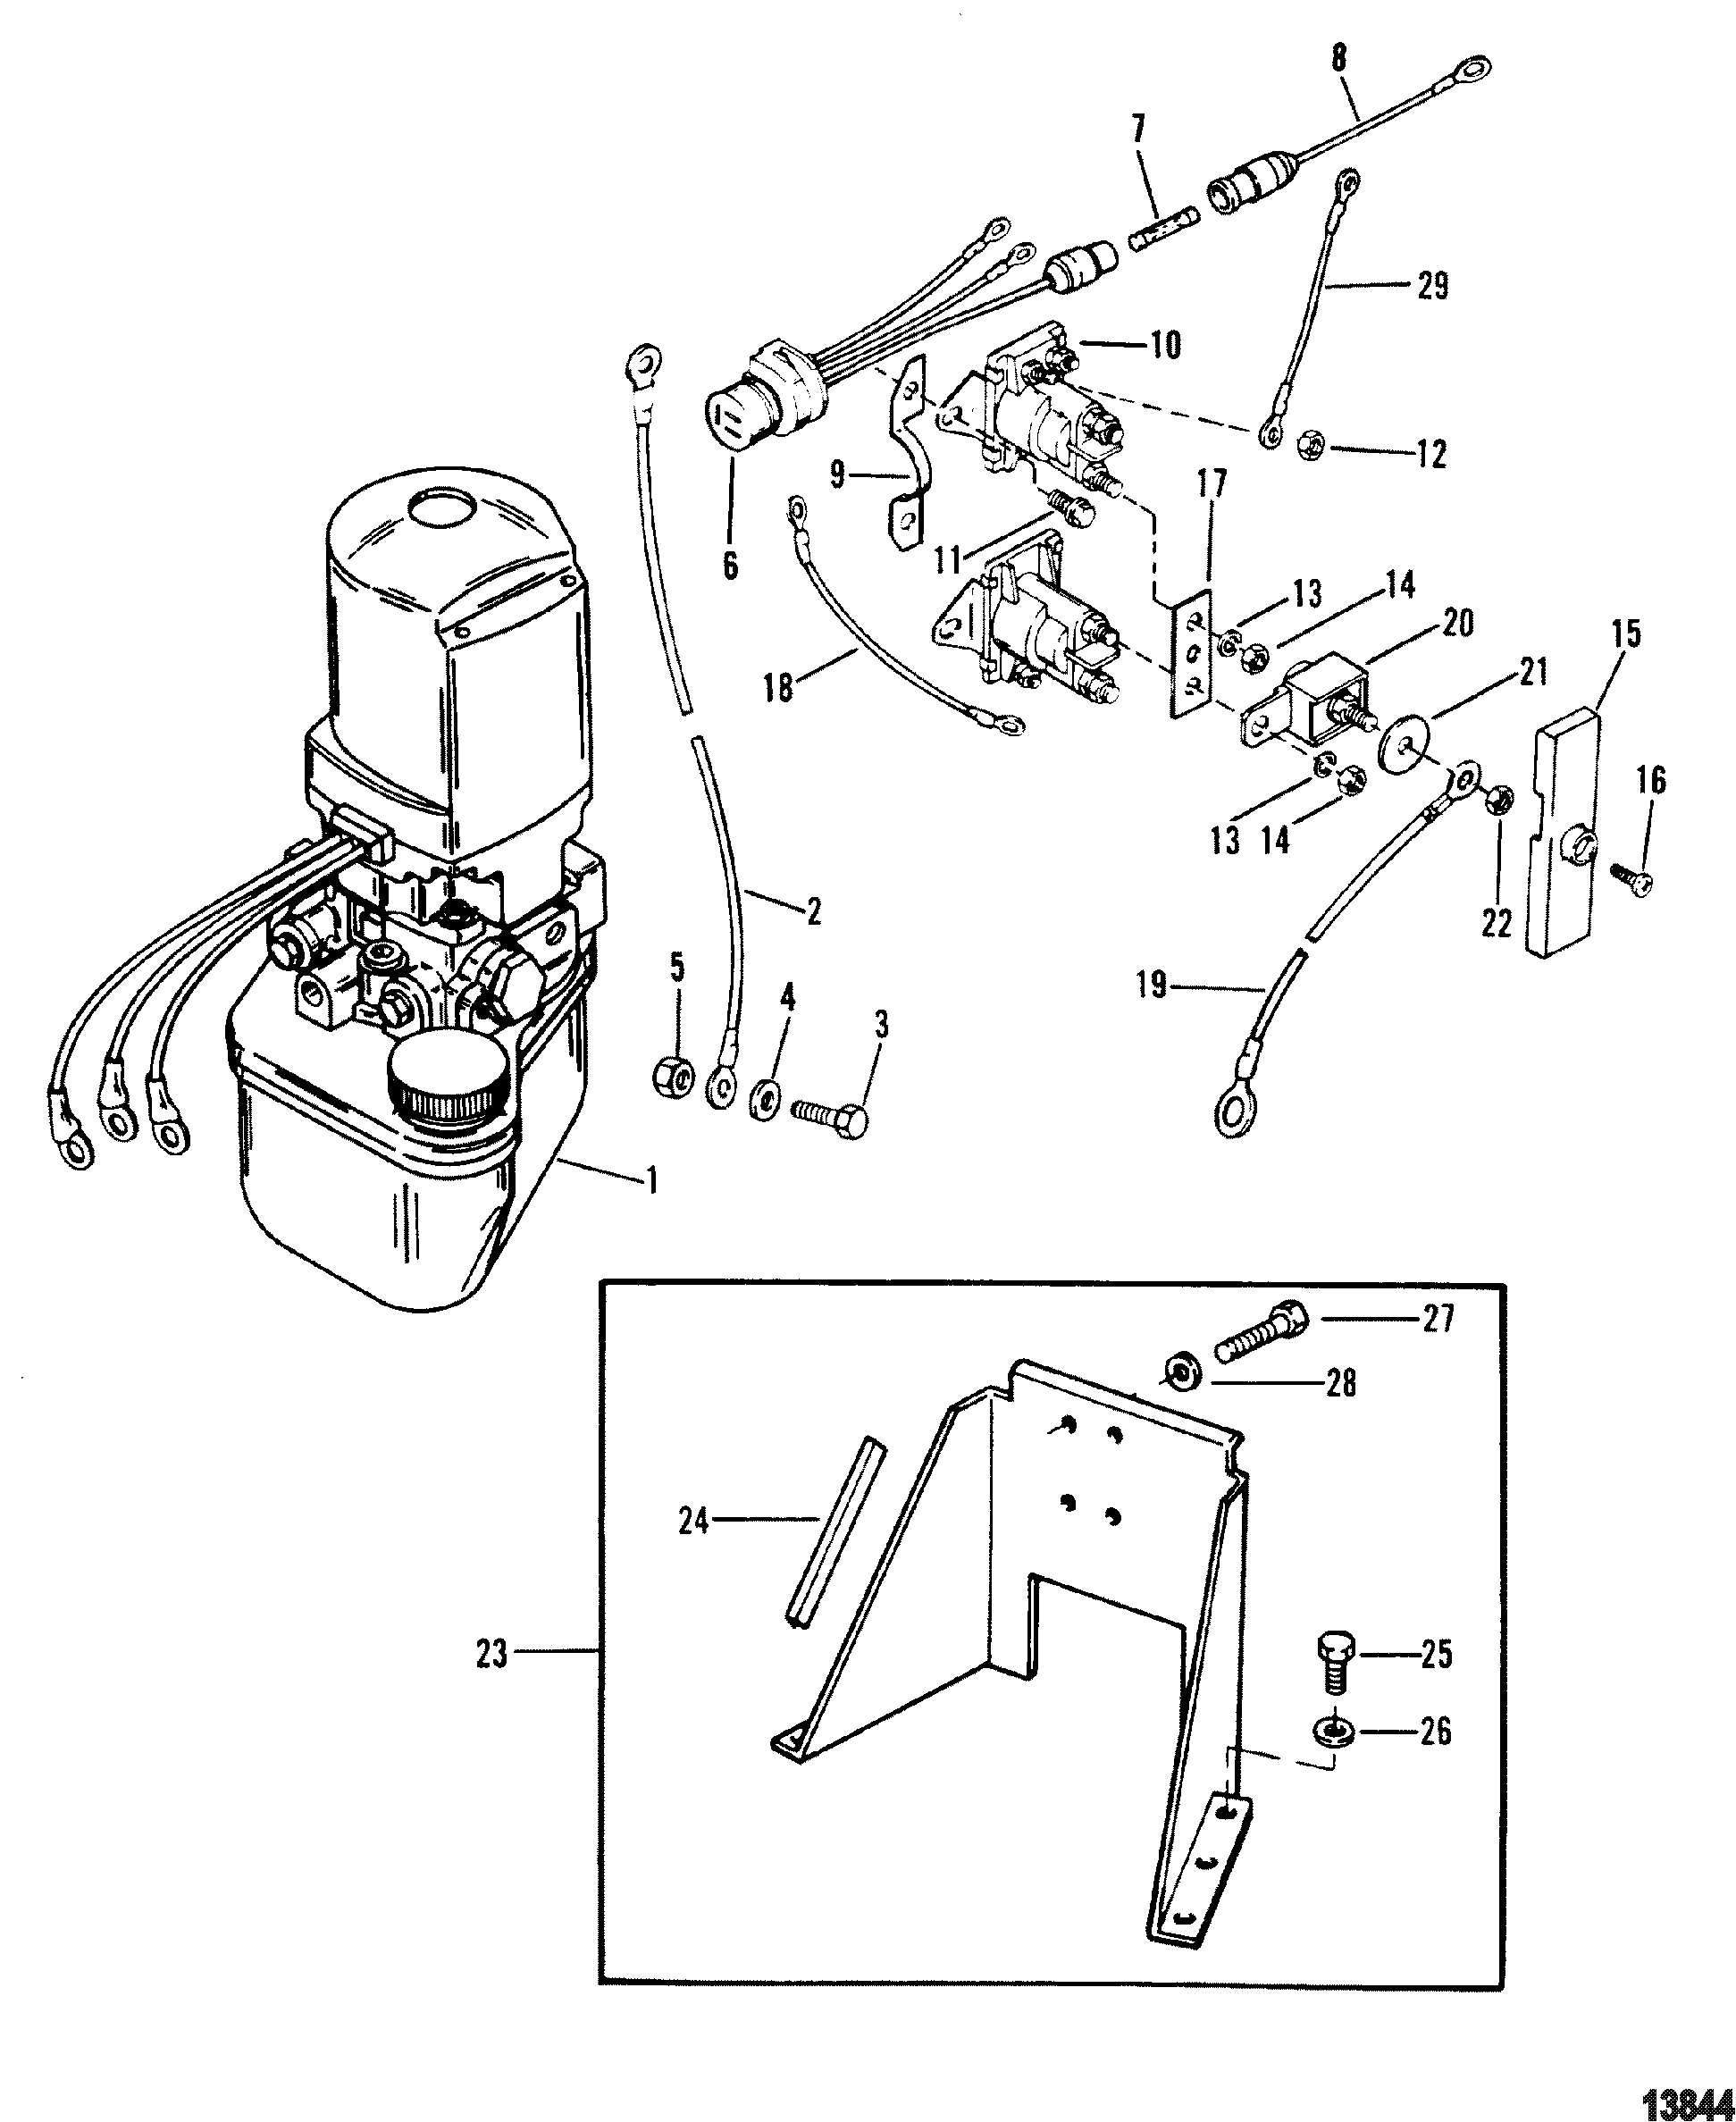 alpha one trim wiring diagram for ez go golf cart electric hydraulic pump and bracket mercruiser gen ii